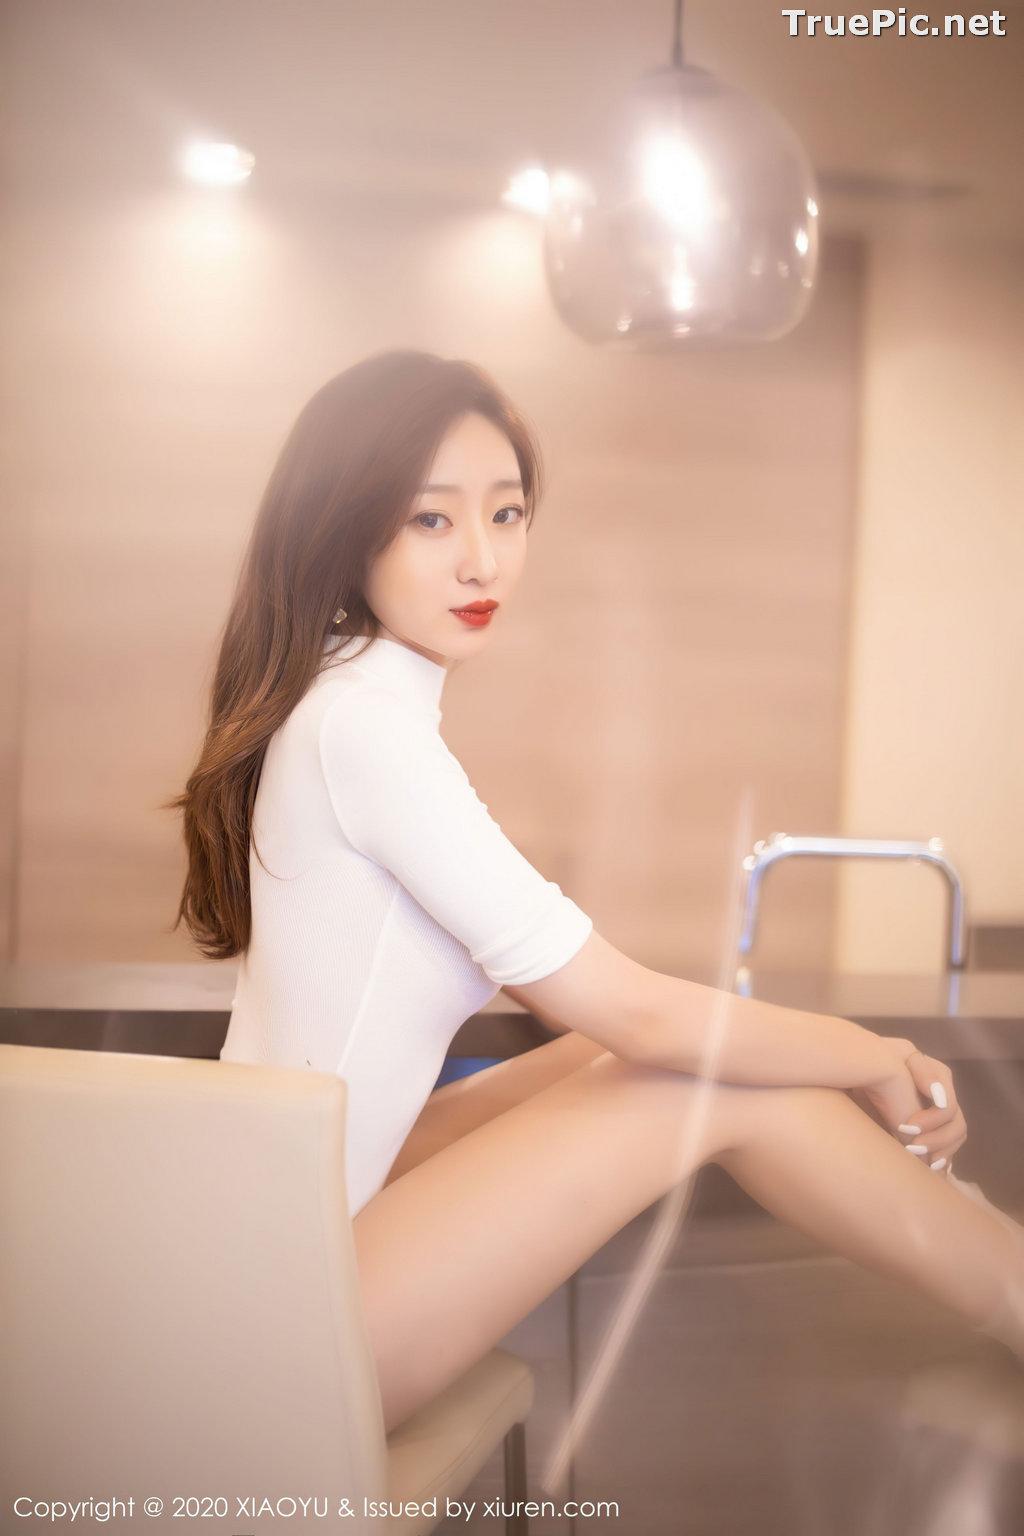 Image XiaoYu Vol.389 - Chinese Model - 安琪 Yee - Beautiful In White - TruePic.net - Picture-3